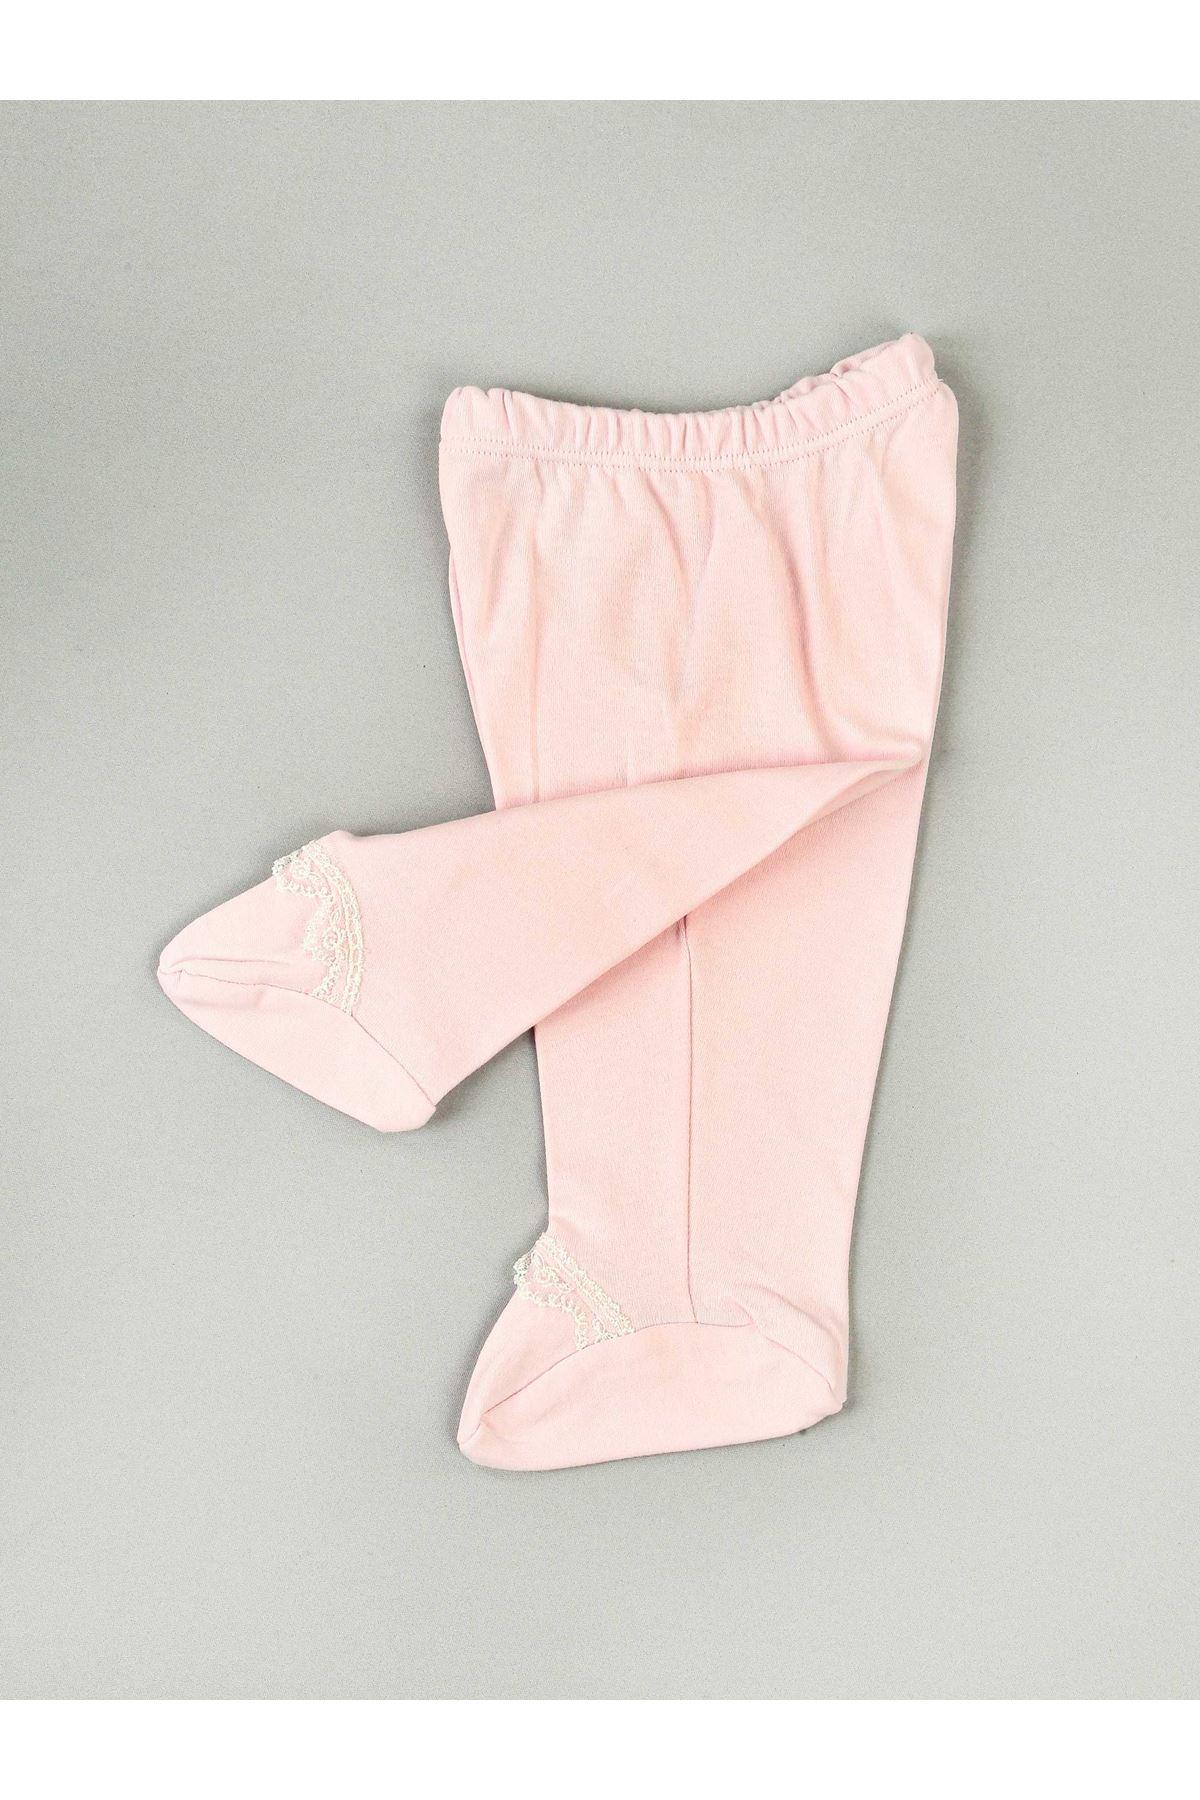 Pink White Baby Girl Newborn 10 Piece Suit Hospital Wear Cotton Casual Girls Babies Sets Seasonal Models